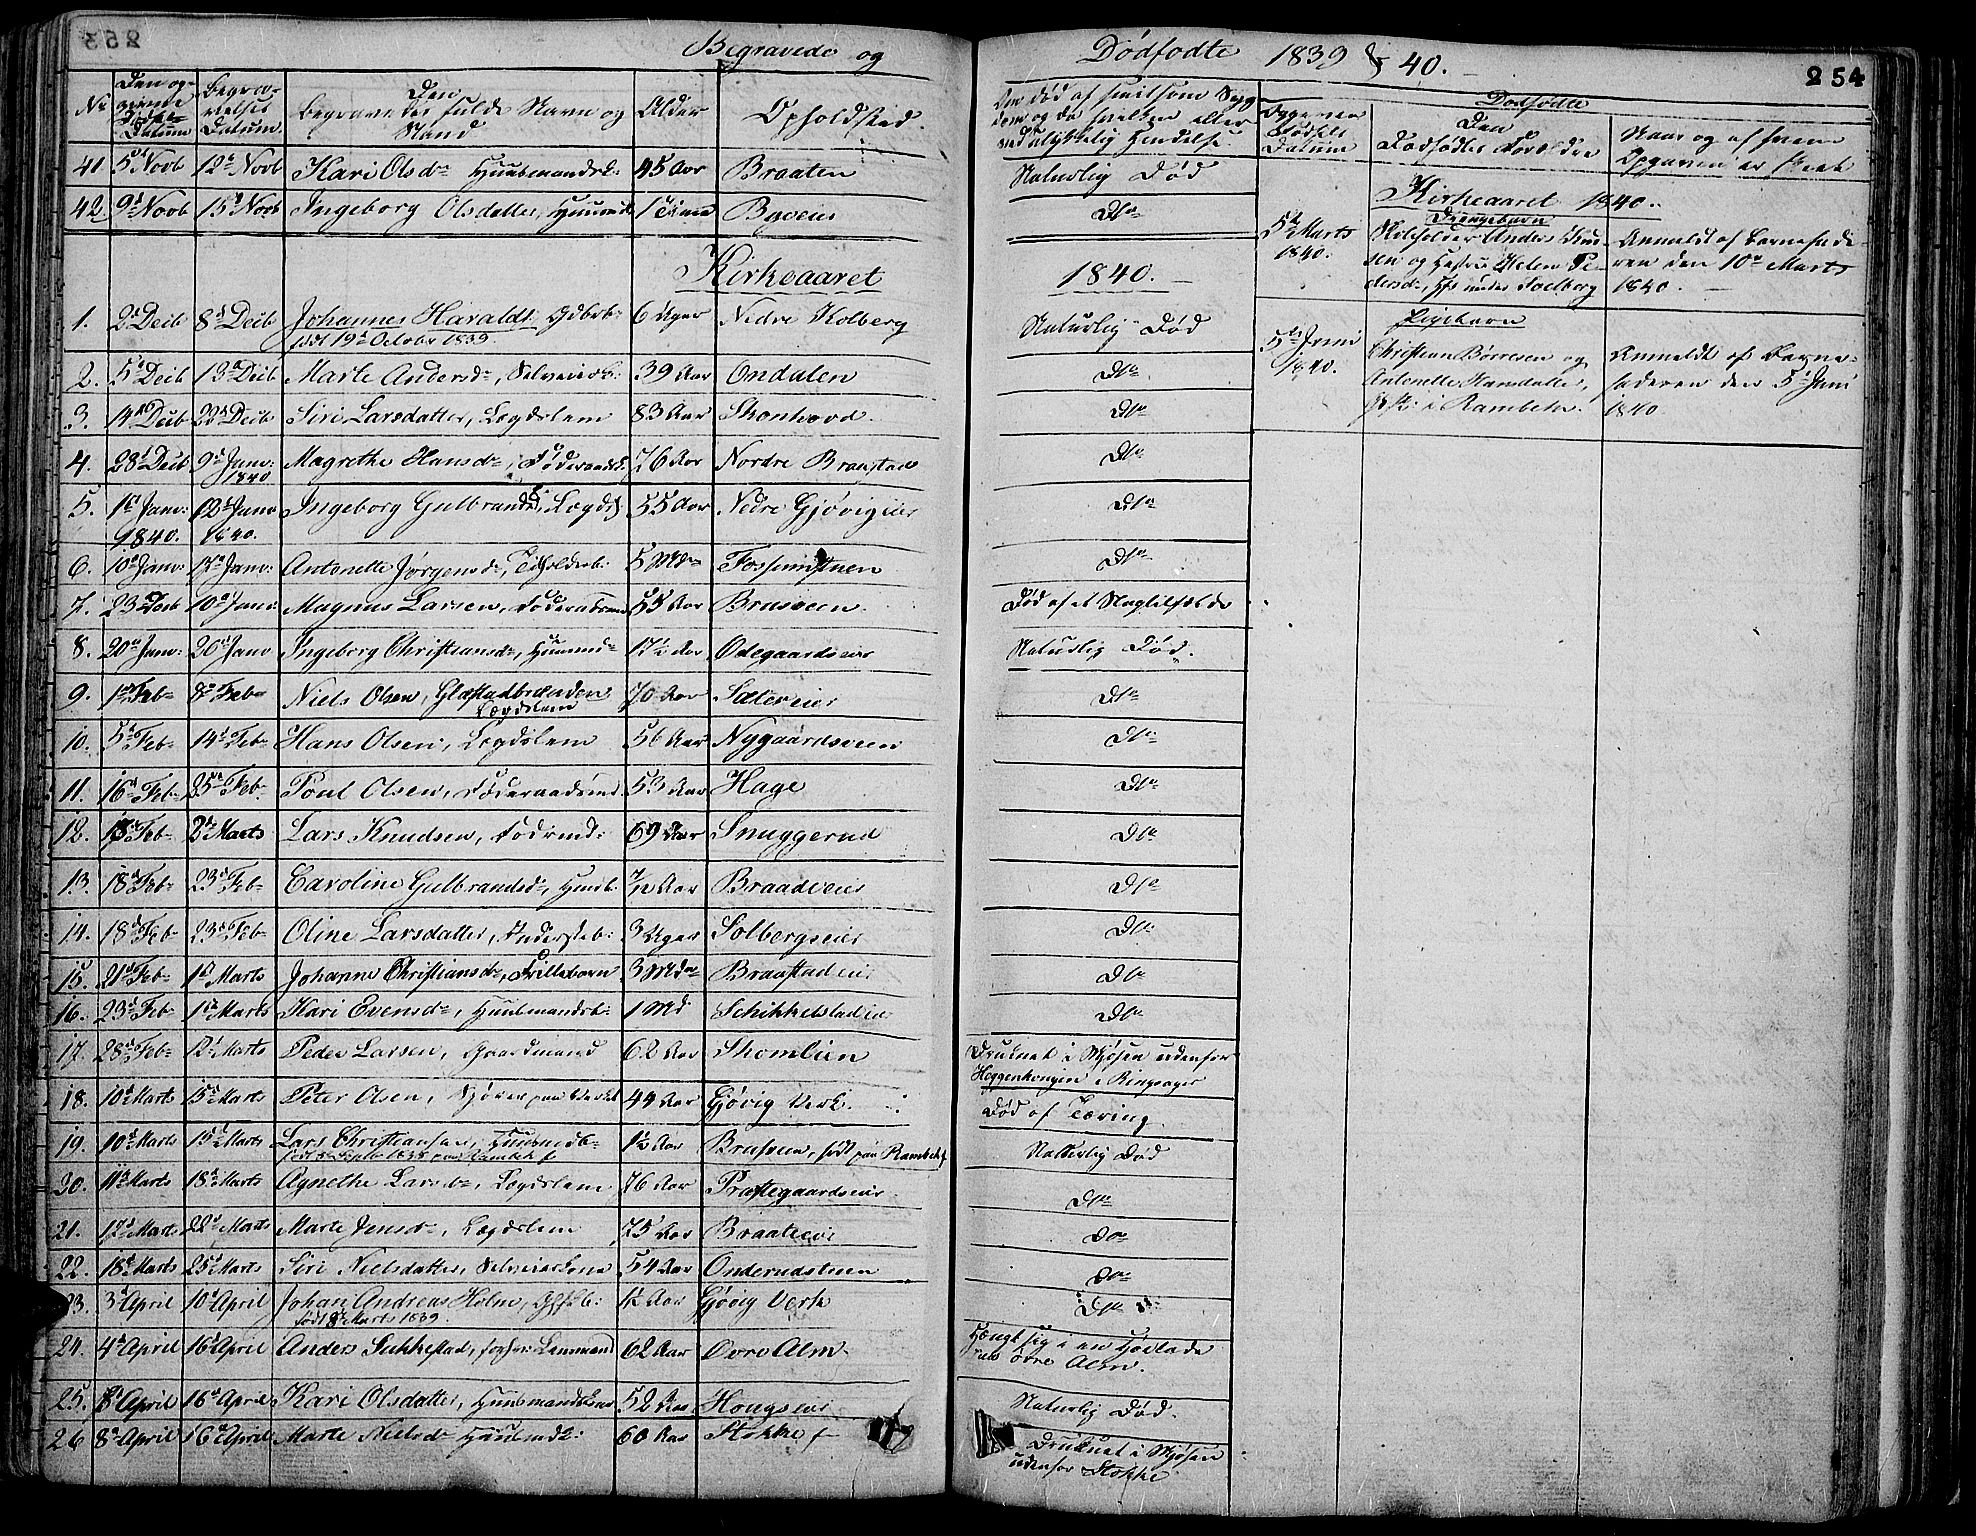 SAH, Vardal prestekontor, H/Ha/Hab/L0004: Klokkerbok nr. 4, 1831-1853, s. 254